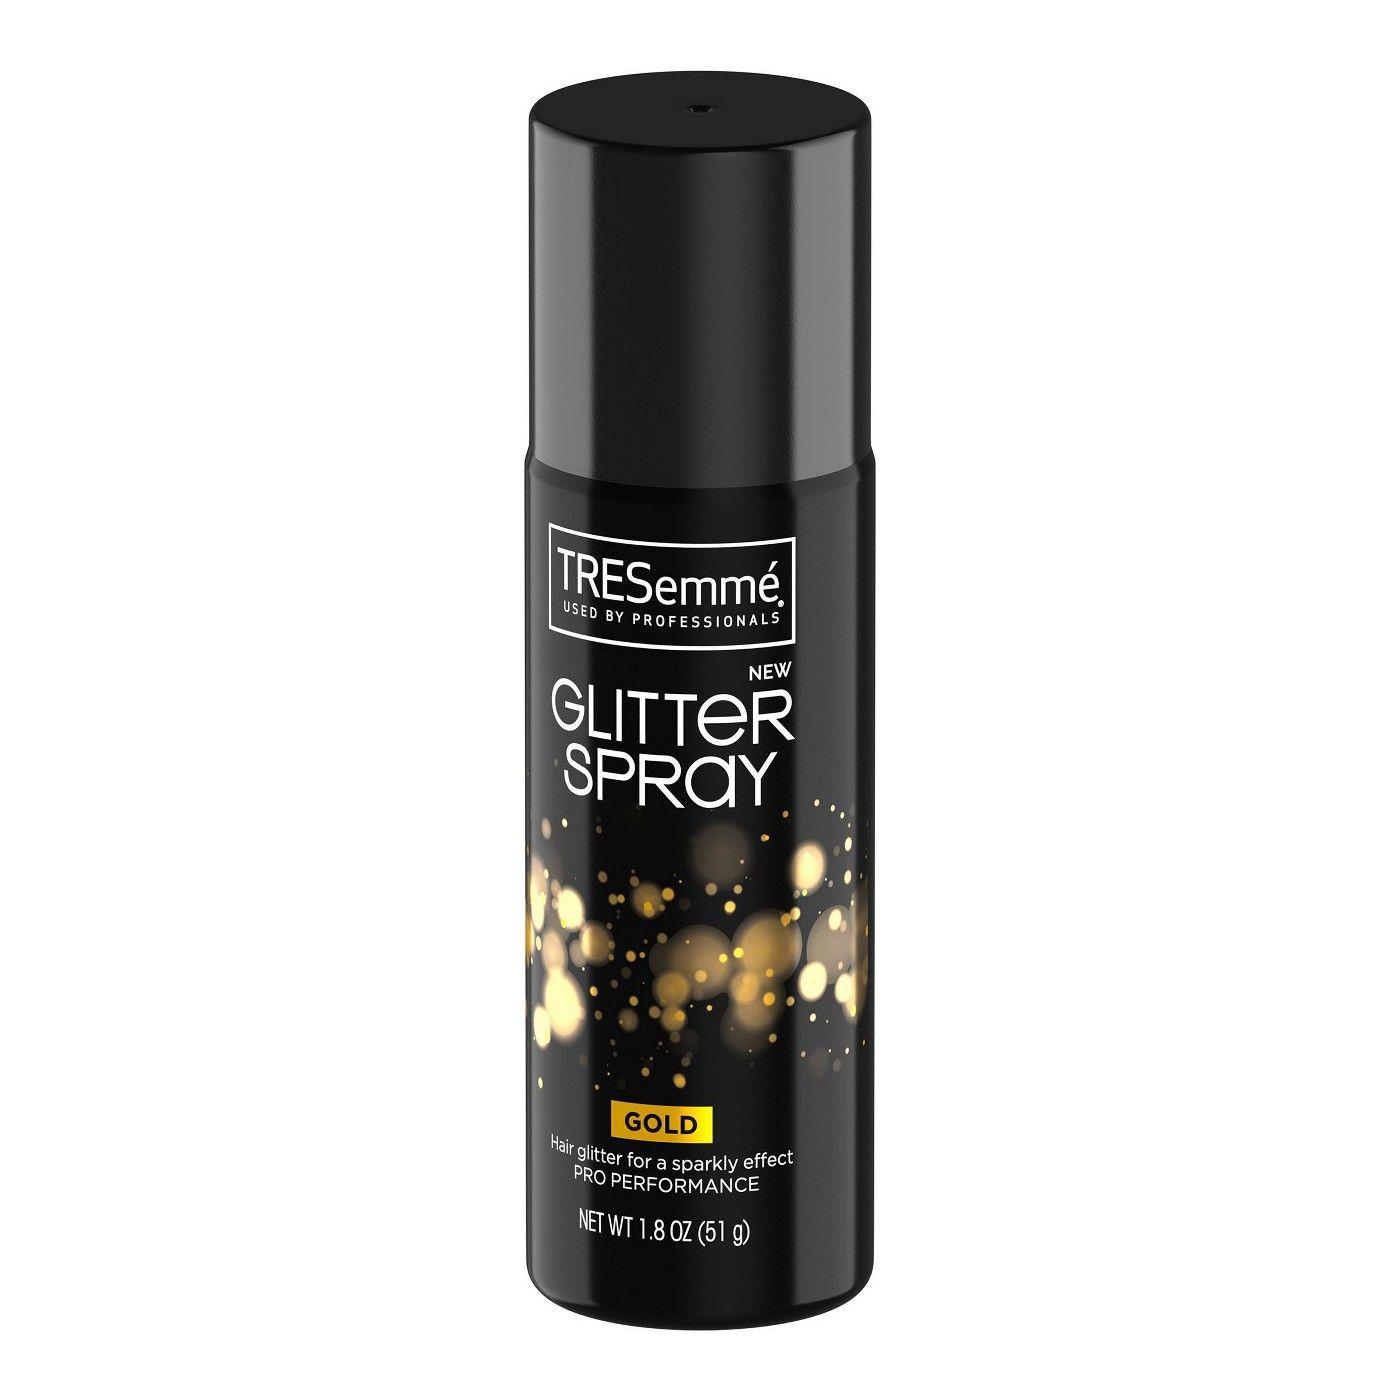 Tresemme Glitter Hair Spray Gold 1 8oz Glitter Hair Spray Glitter Hair Dark Dry Shampoo